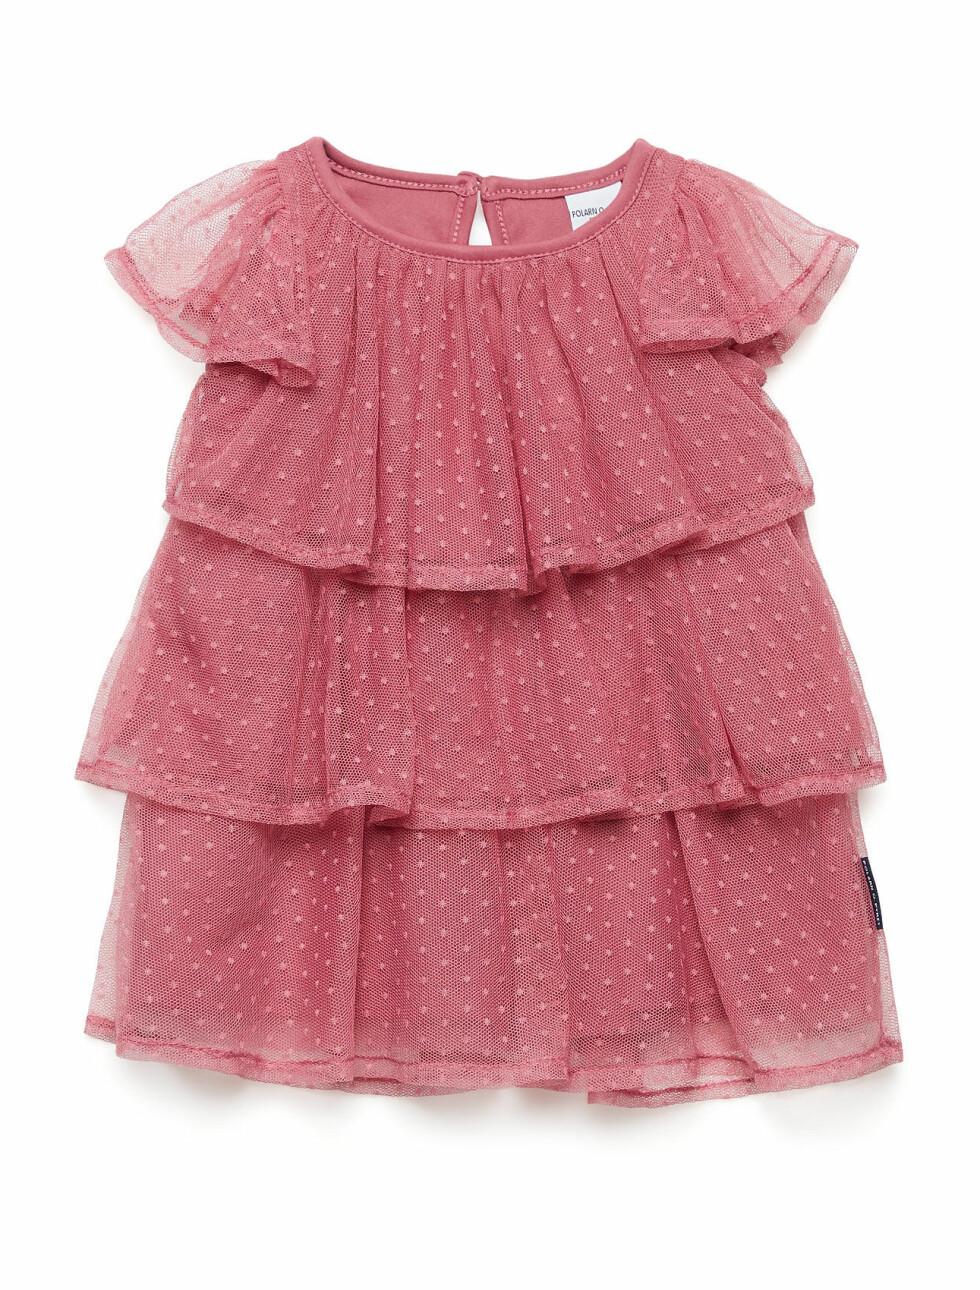 Kjole fra Polarn O. Pyret |399,-| https://www.boozt.com/no/no/polarn-o-pyret/dress-tulle-baby_19196231/19196236?navId=68013&group=listing&position=1000000